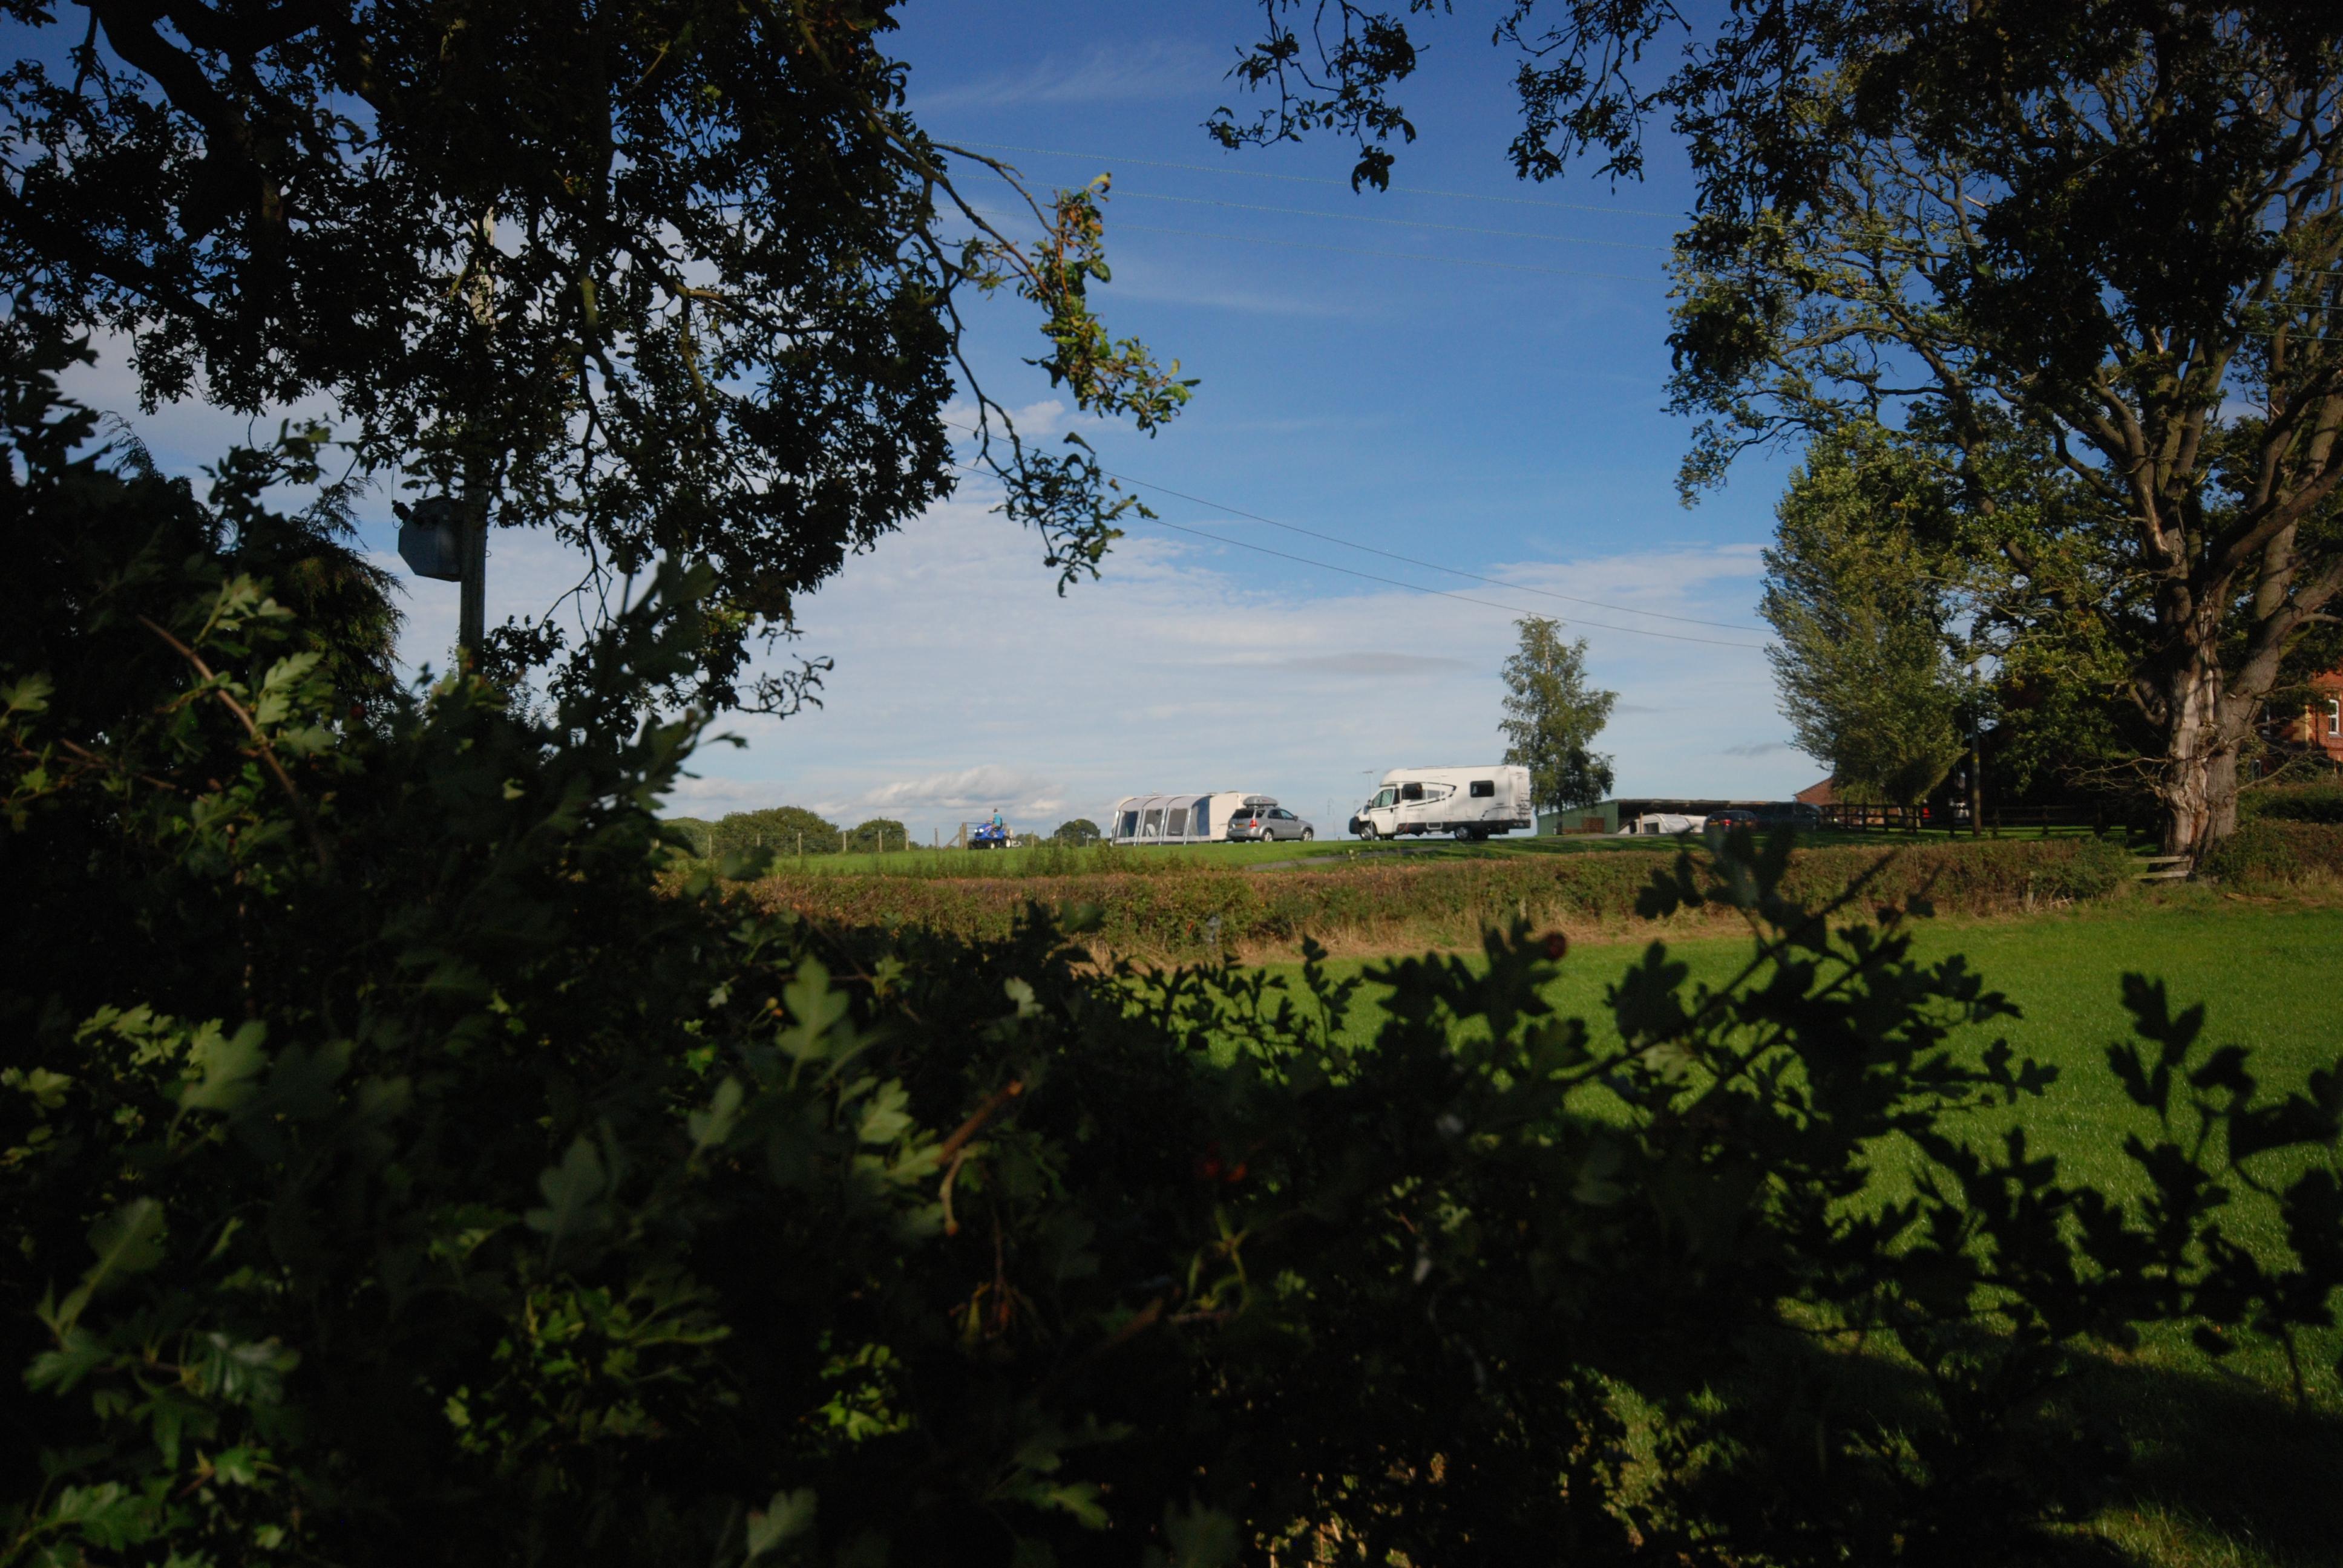 Caravan site seen from The Dingle